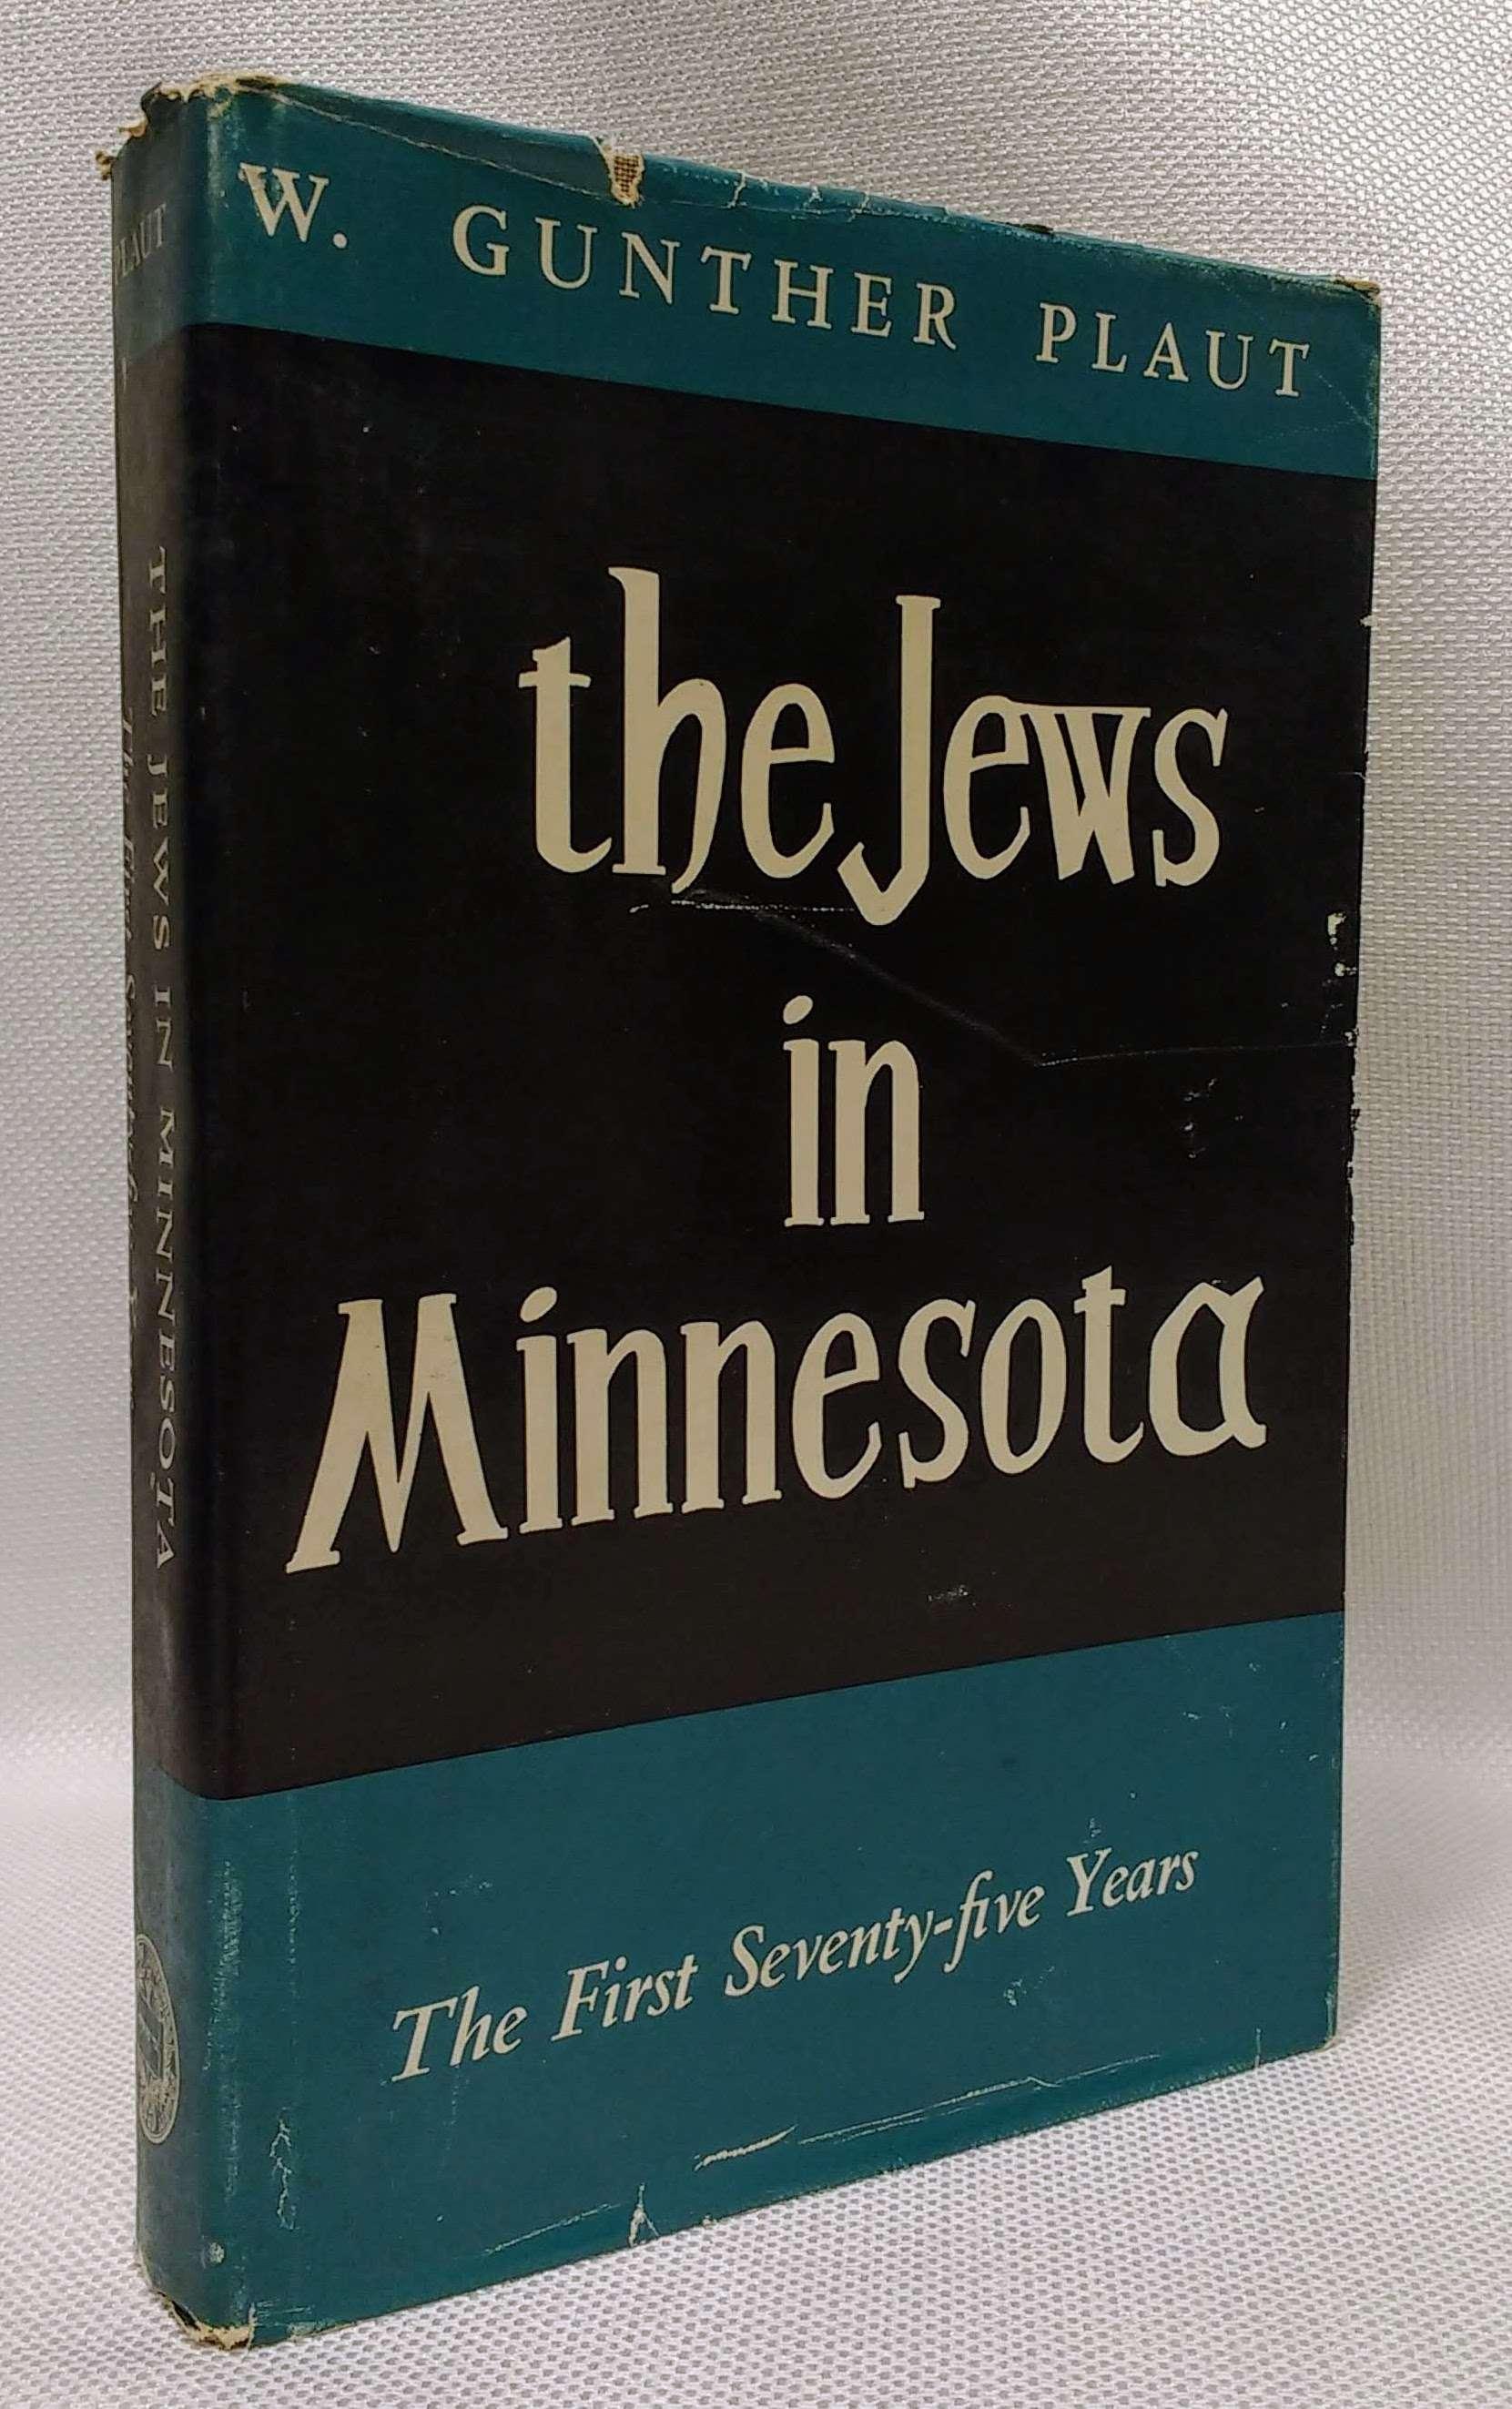 The Jews in Minnesota the First Seventy-five Years [American Jewish Communal Histories, No. 3], W. Gunther Plaut